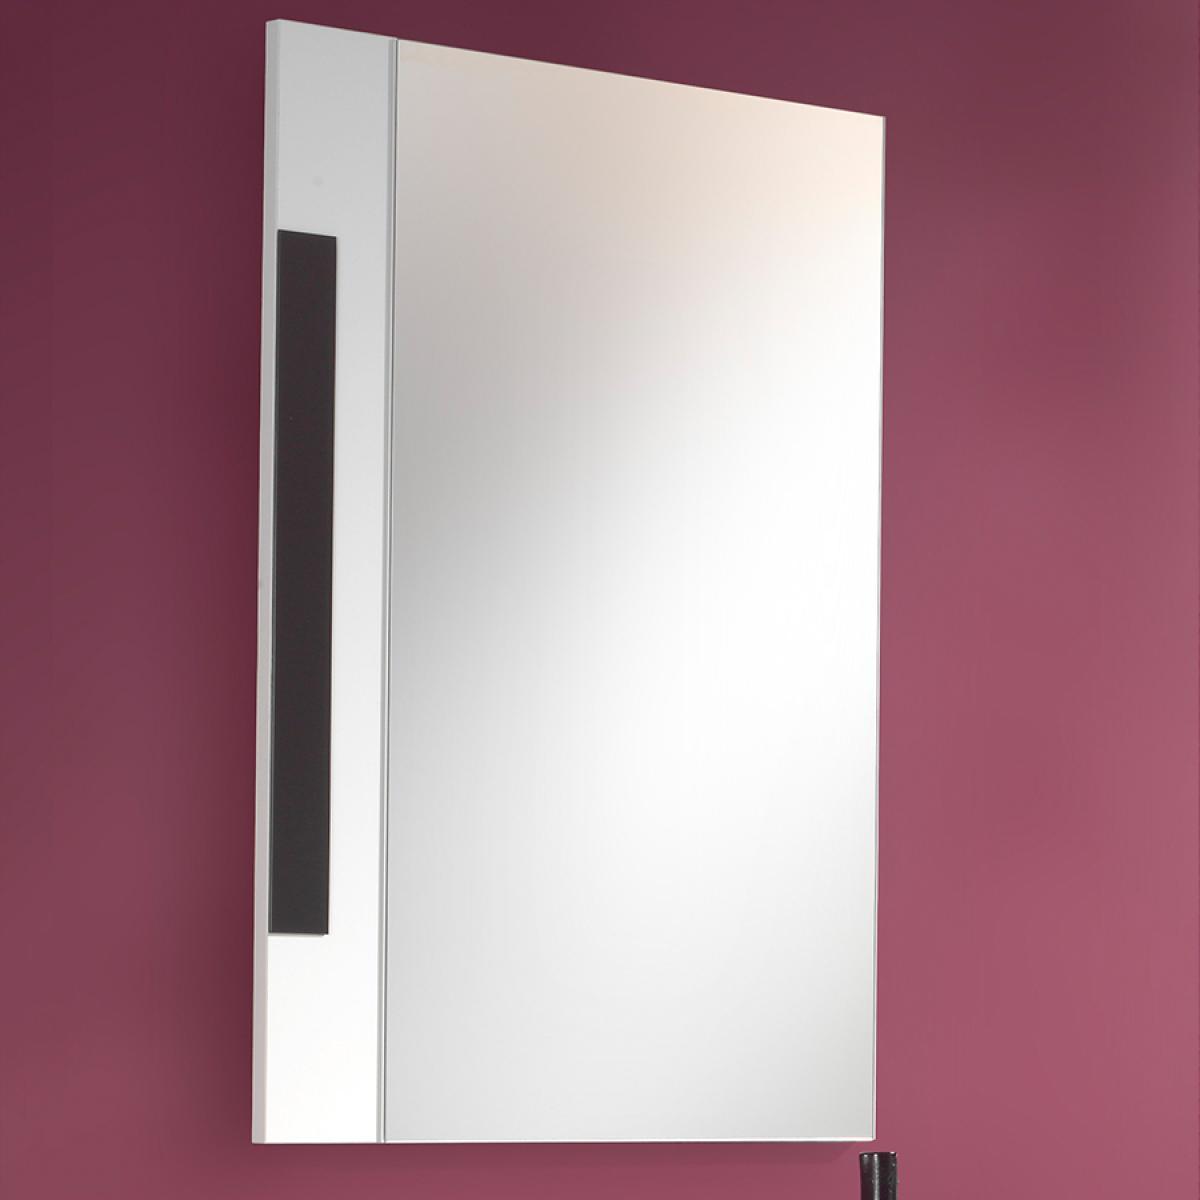 Nouvomeuble Miroir mural blanc et gris design ARMANA